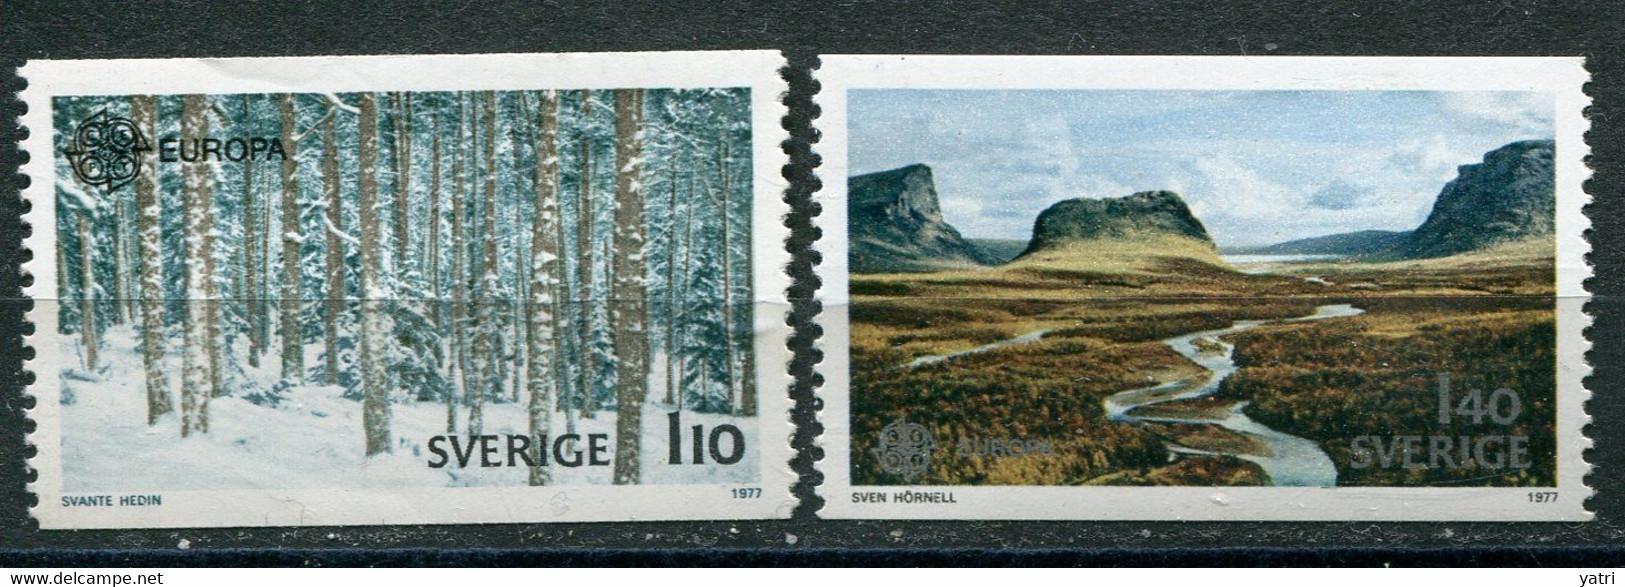 Europa Cept 1977 - Svezia, 1,10 Kr ** - Europa-CEPT